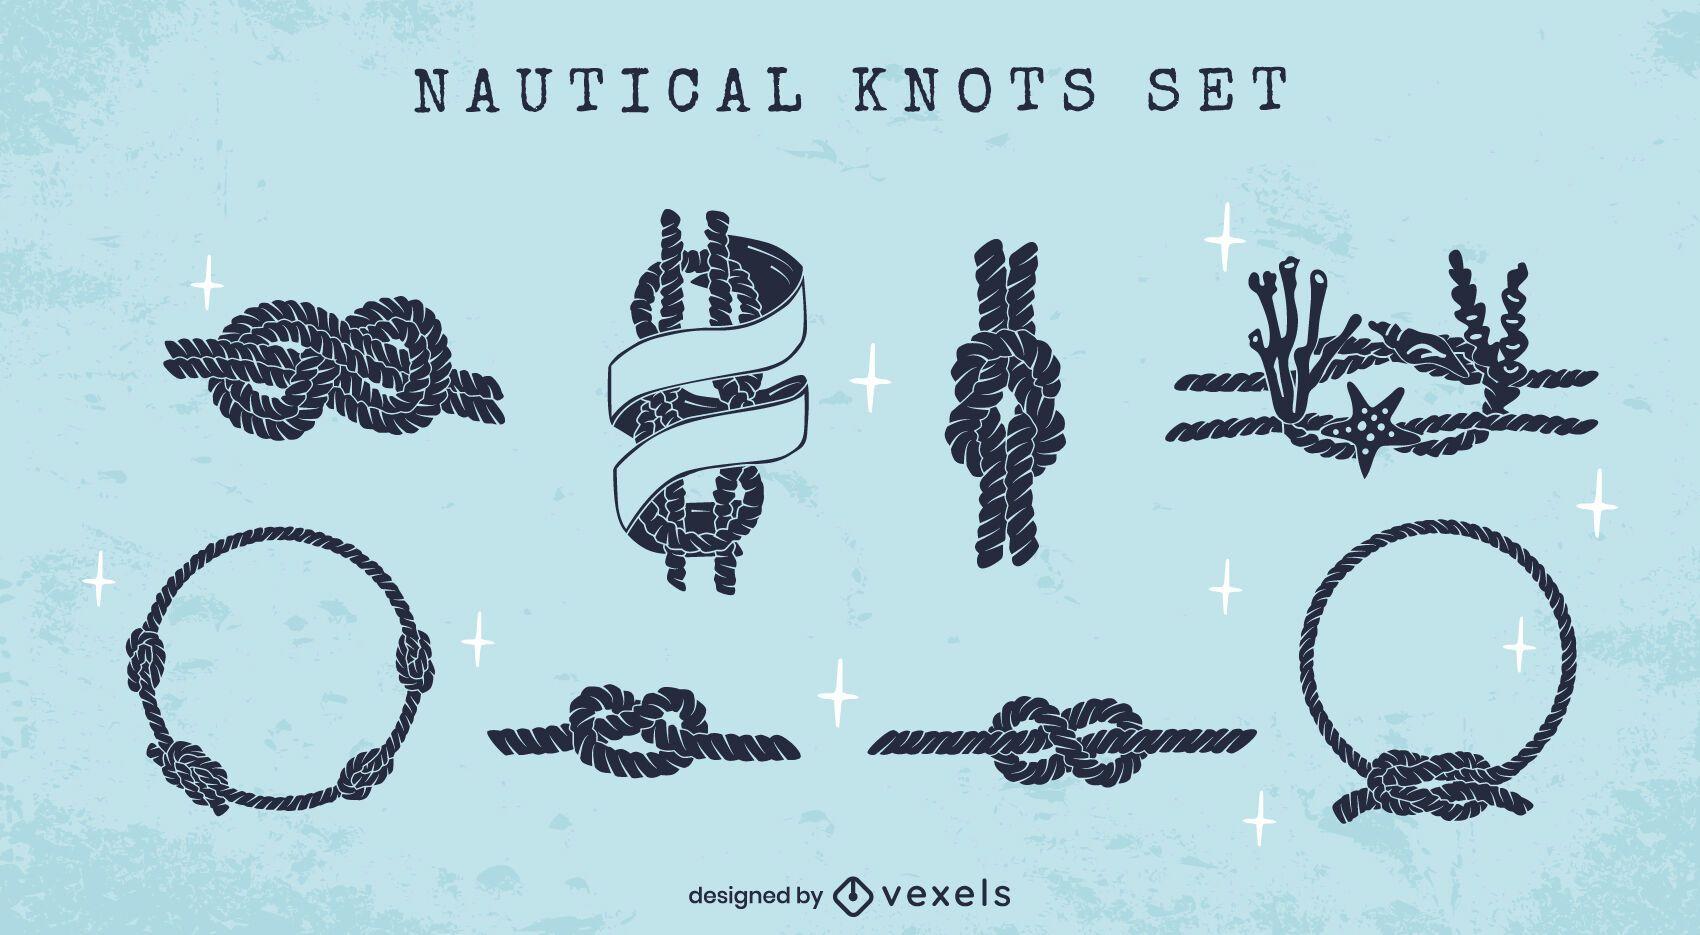 Sailing knots nautical silhouette set